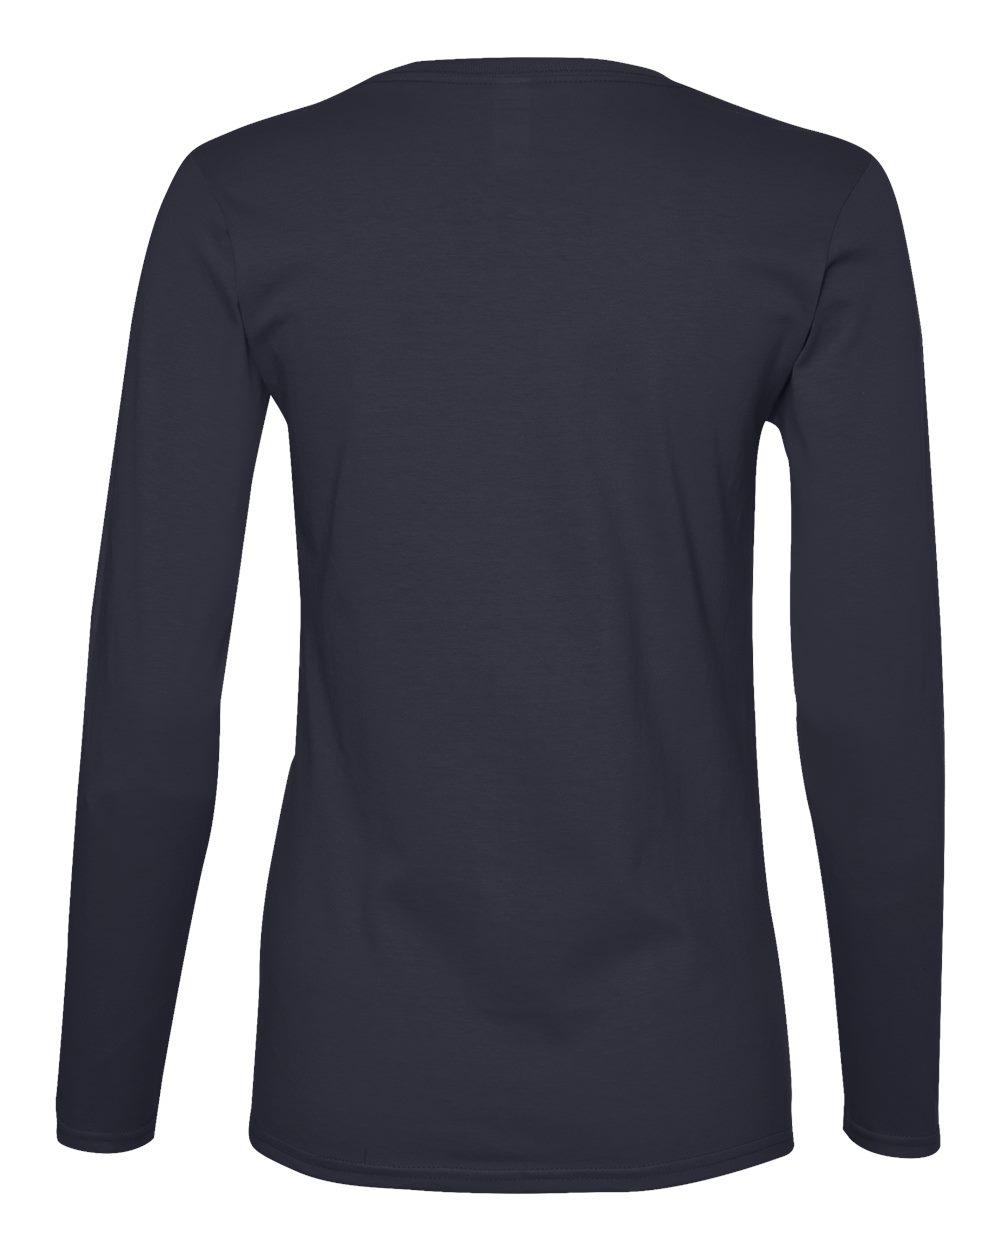 Anvil-Womens-Lightweight-Long-Sleeve-T-Shirt-884L-Size-S-2XL thumbnail 23